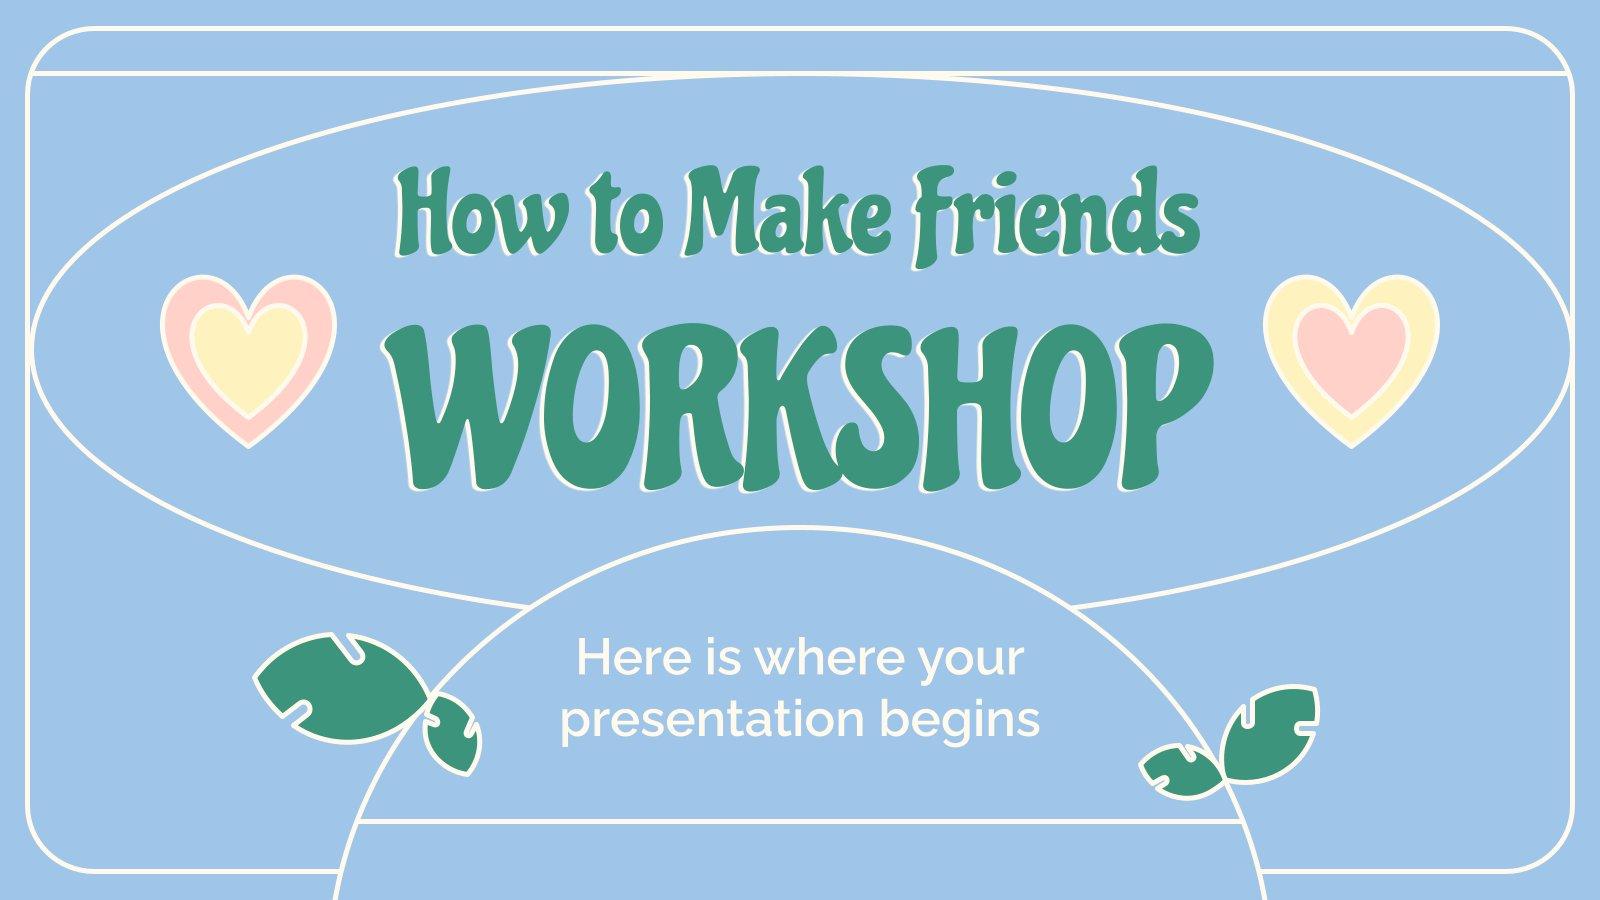 How to Make Friends Workshop presentation template